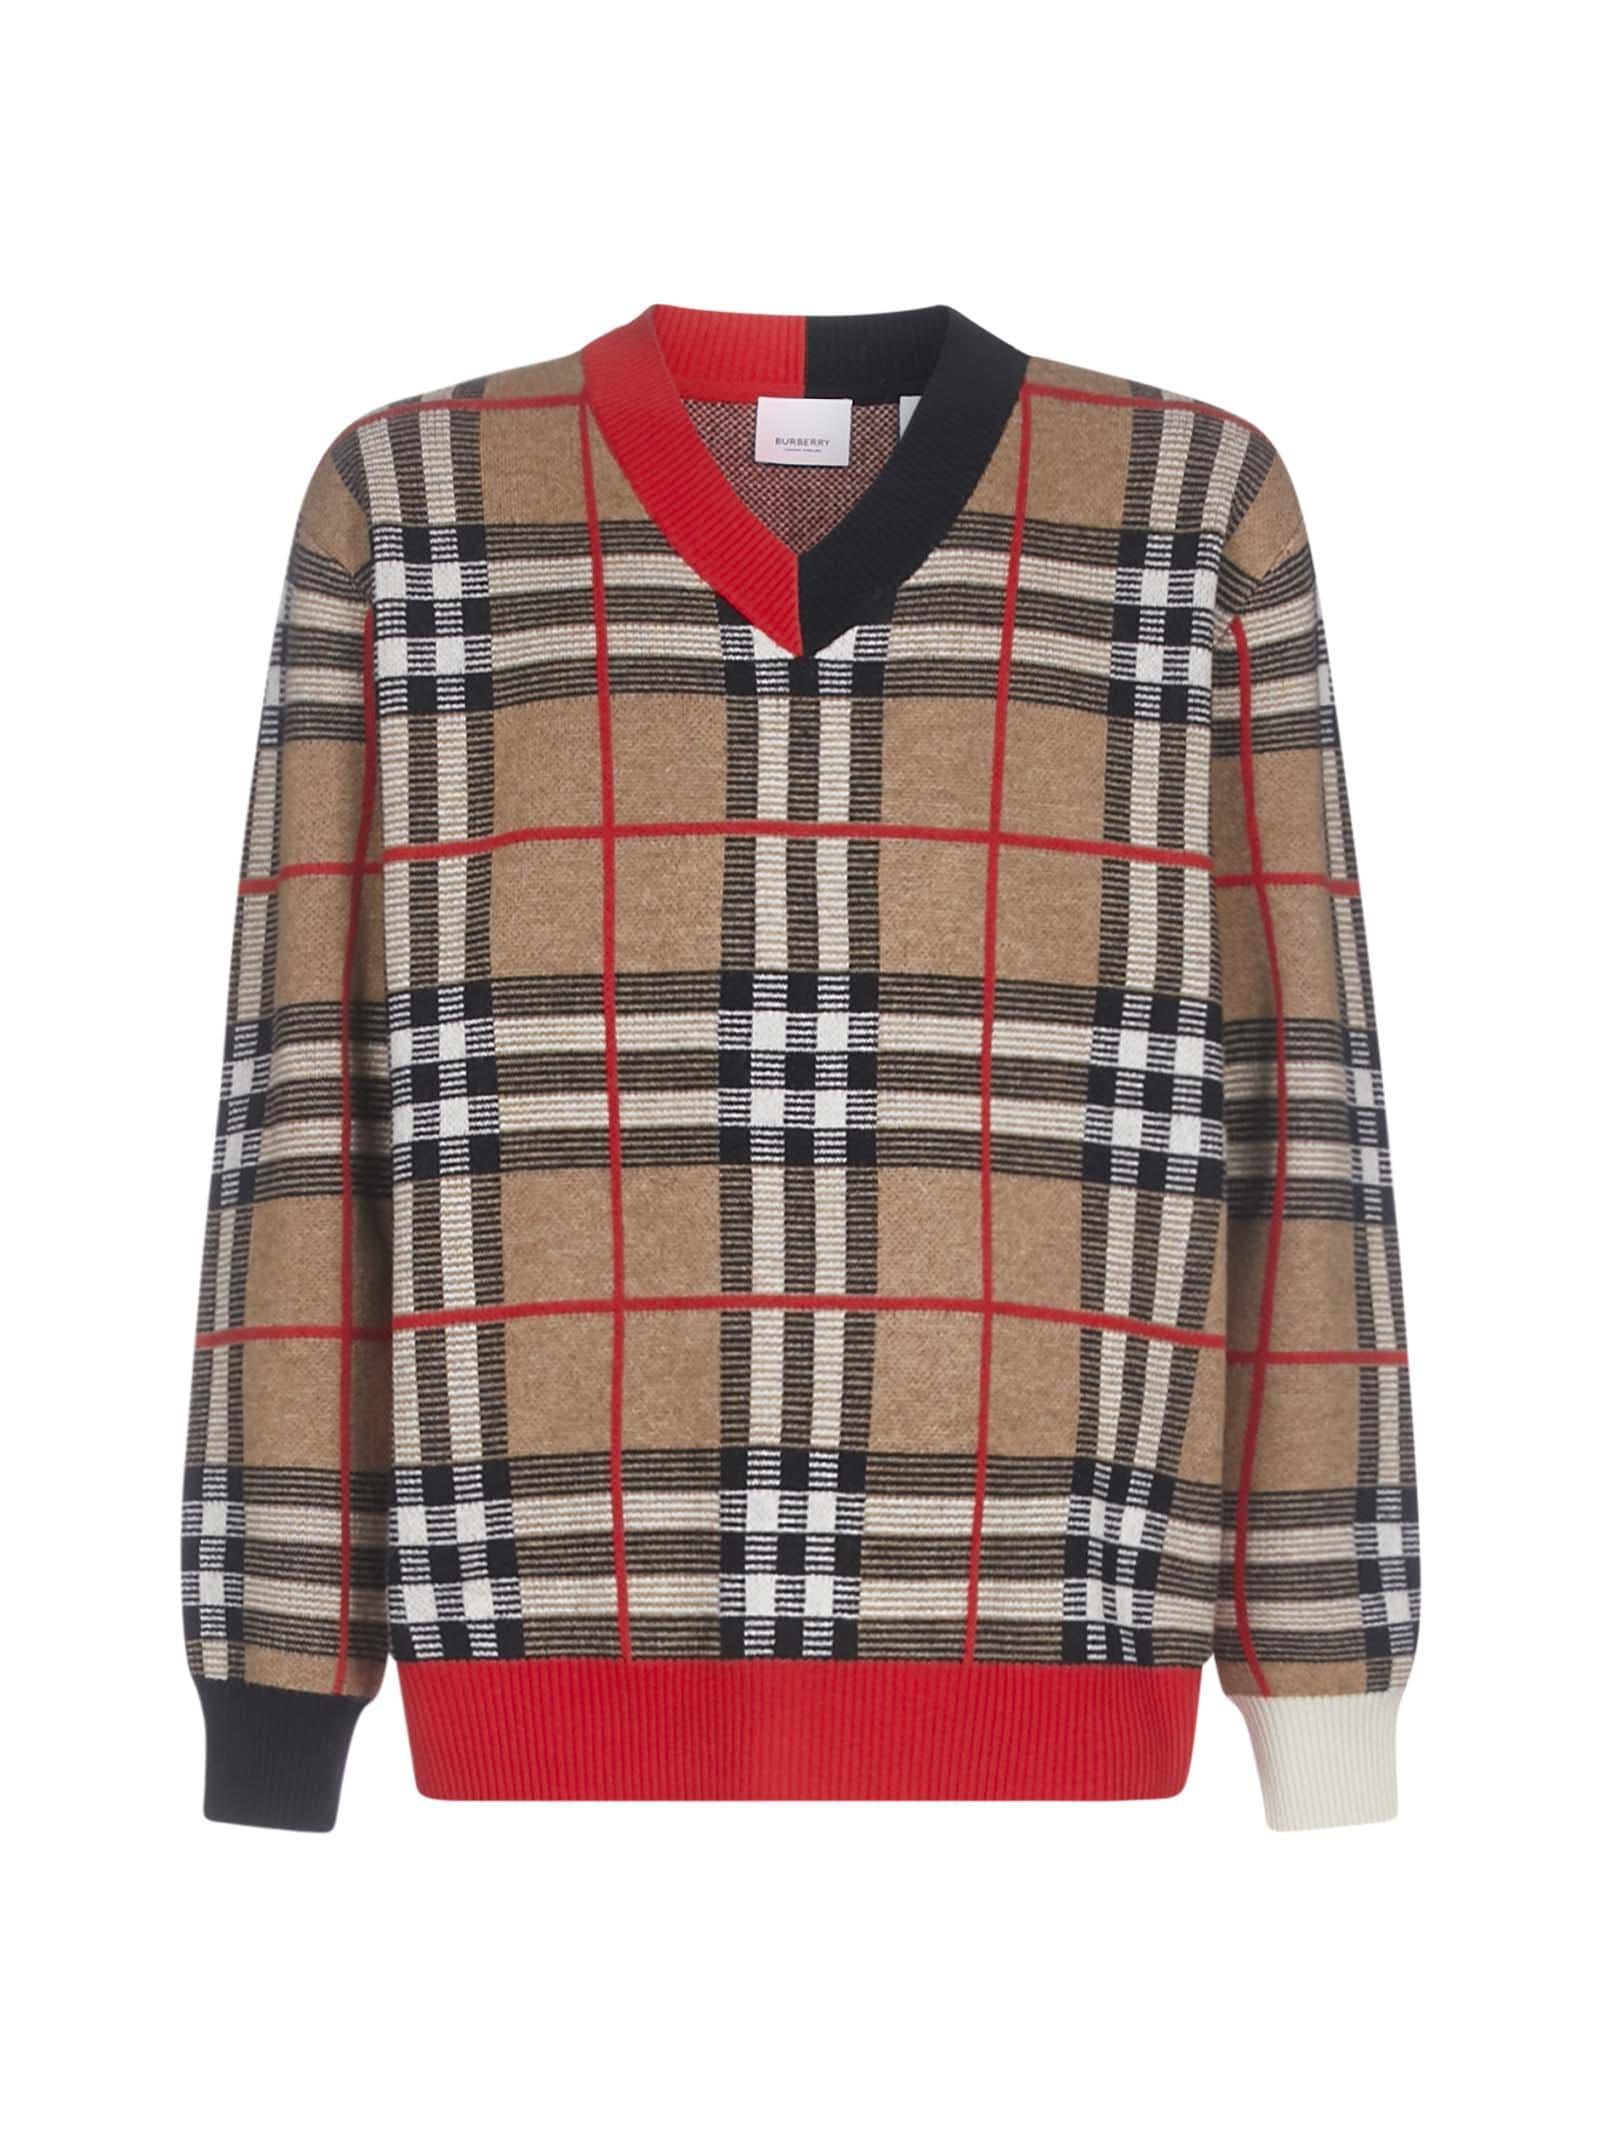 Burberry Duggan Sweater